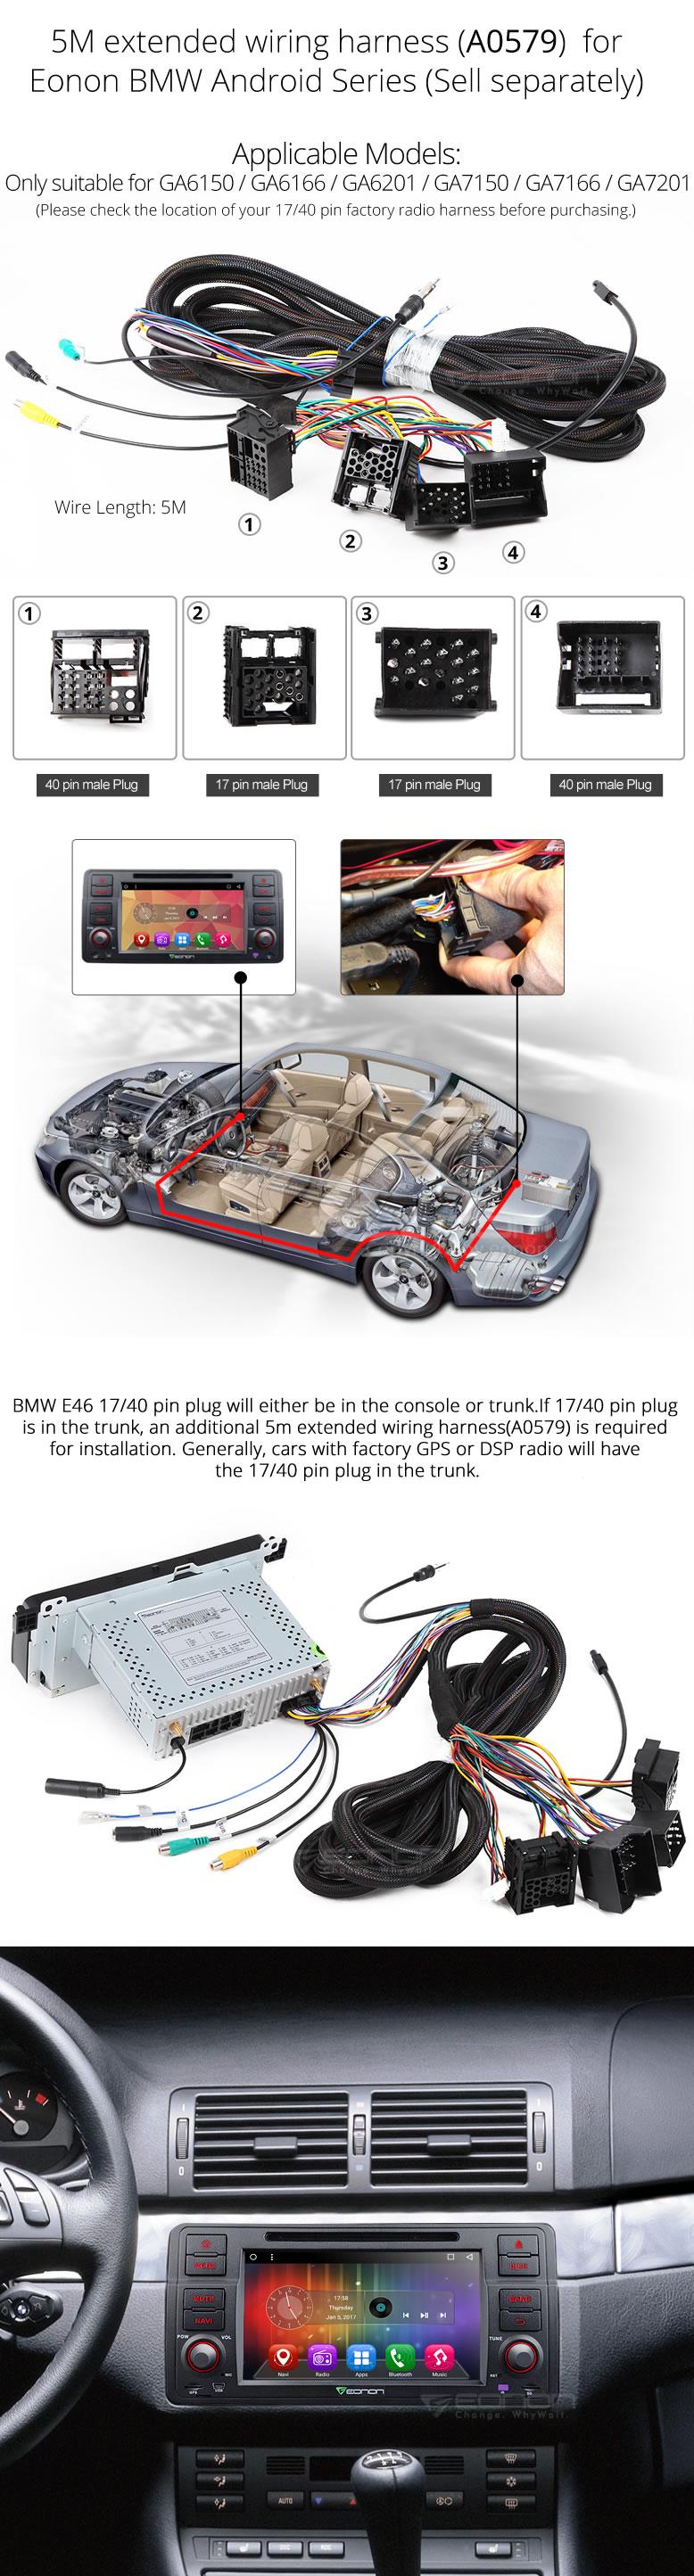 Bmw E46 Gps Wiring Harness Smart Diagrams Eonon Ga7150 Android 6 0 Car Dvd Navigation Rh Com Seat Diagram Connectors